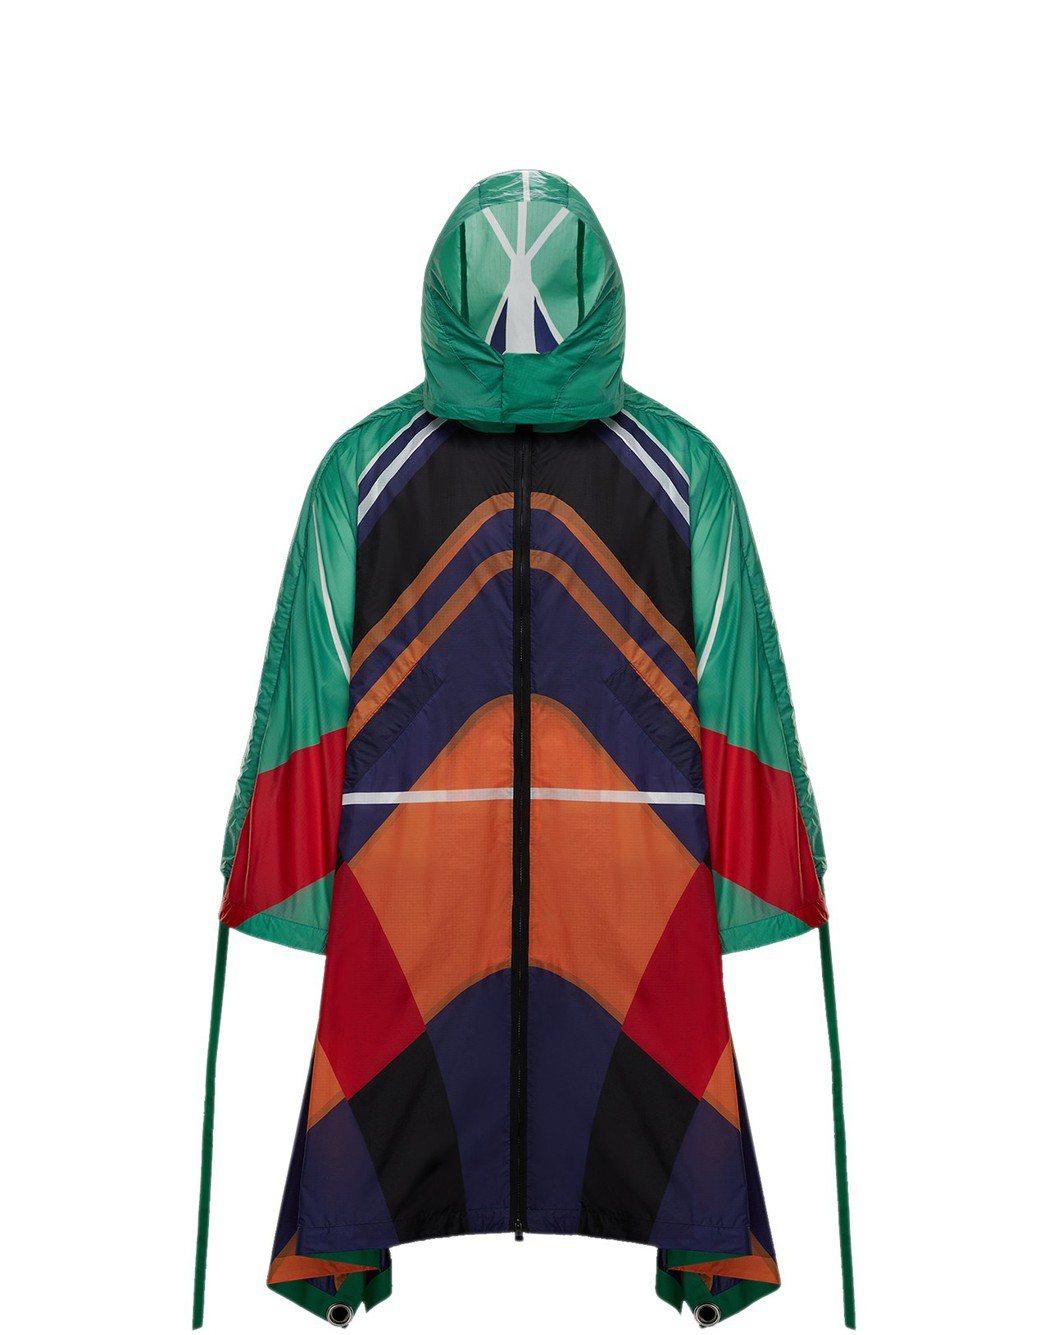 MONCLER O-DAKO多色幾何印花連帽外套,售價86,300元。圖/MON...